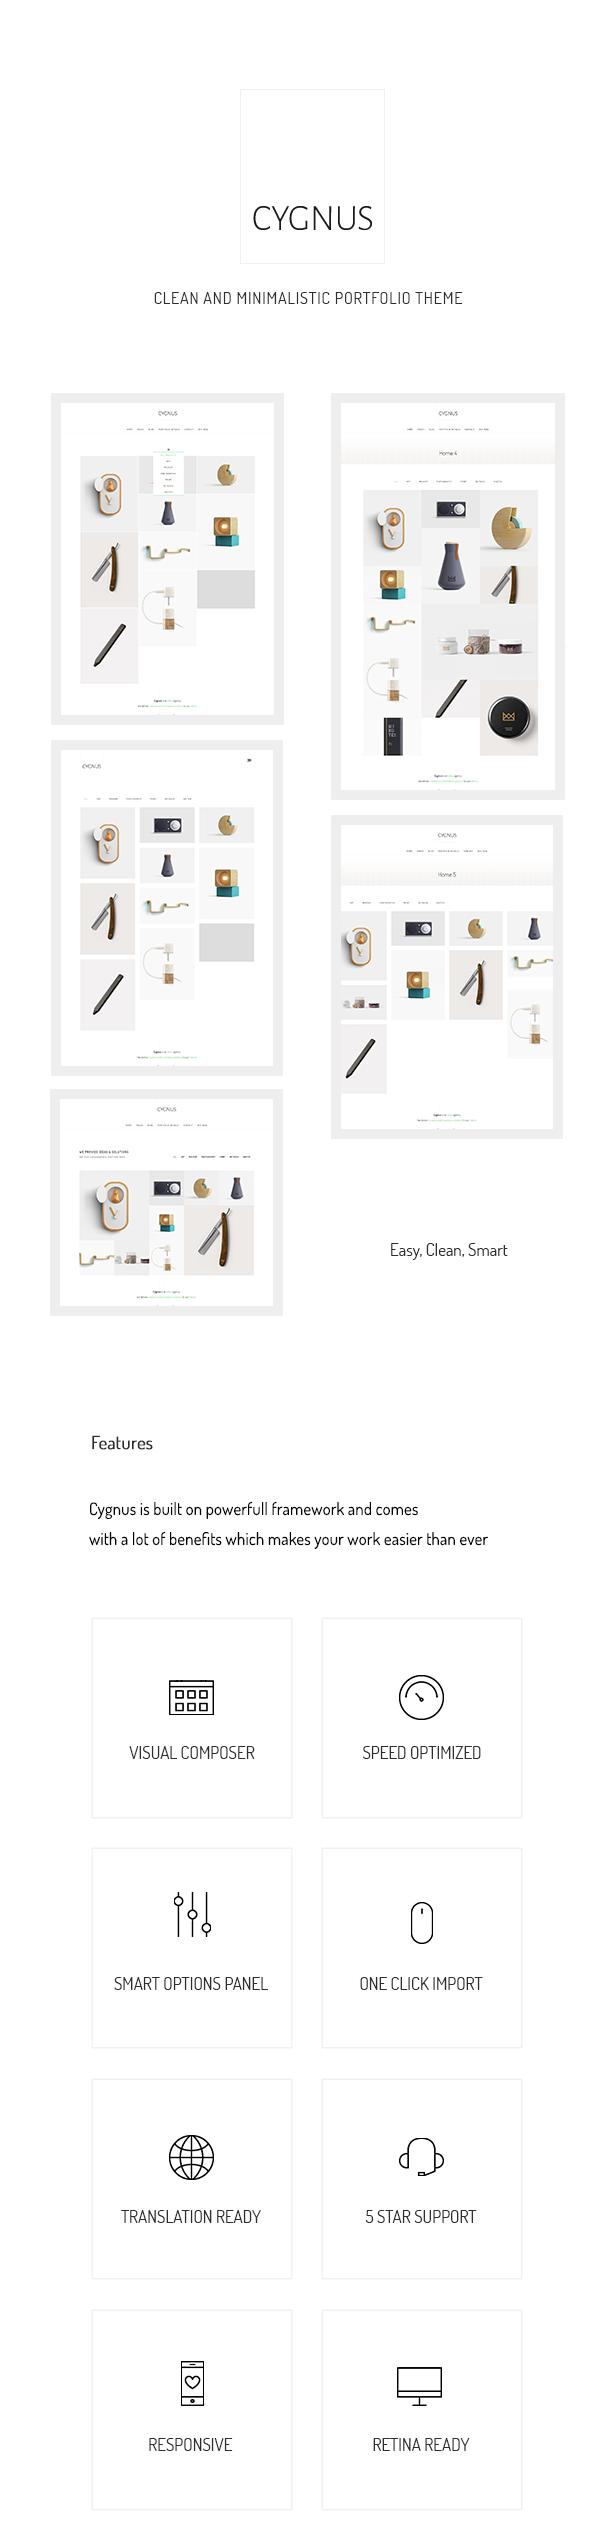 Cygnus - Clean and minimalistic portfolio theme - 1